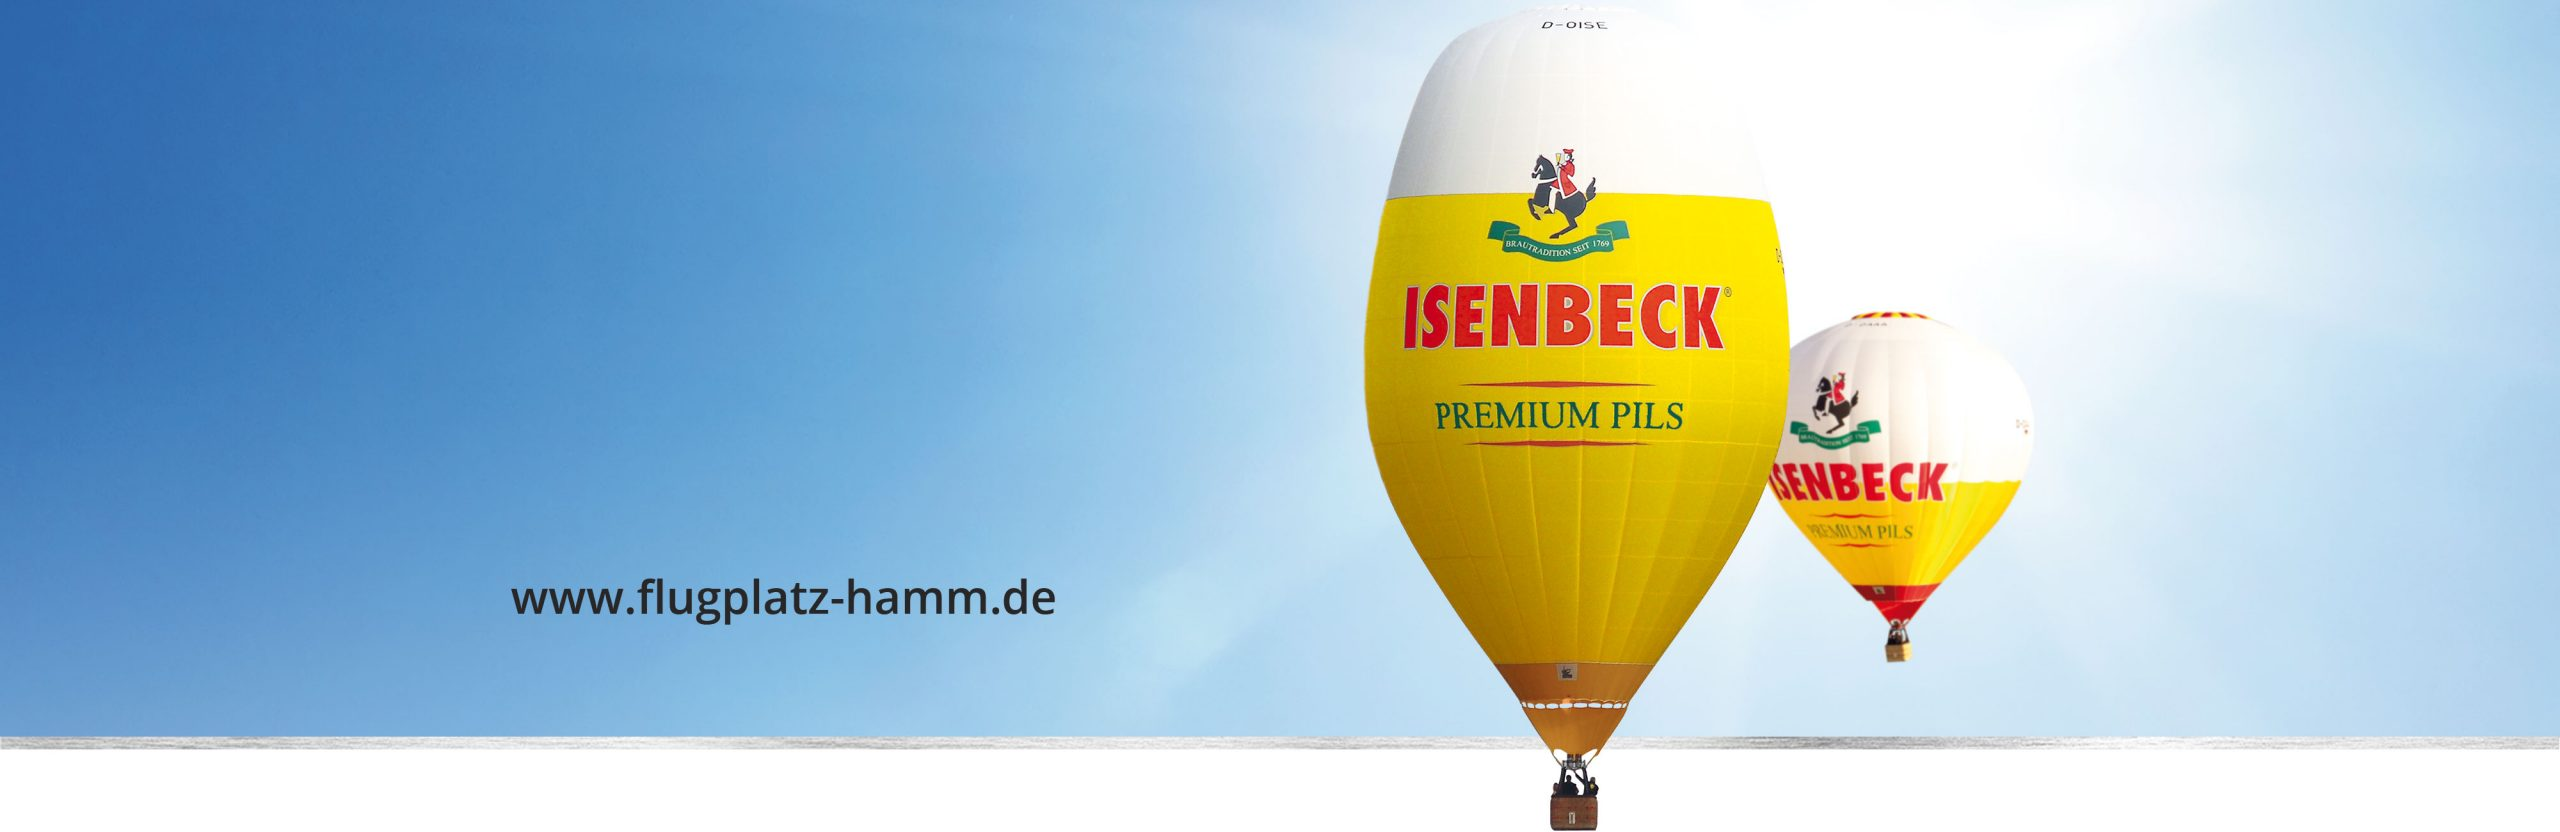 Isenbeck Sponsering